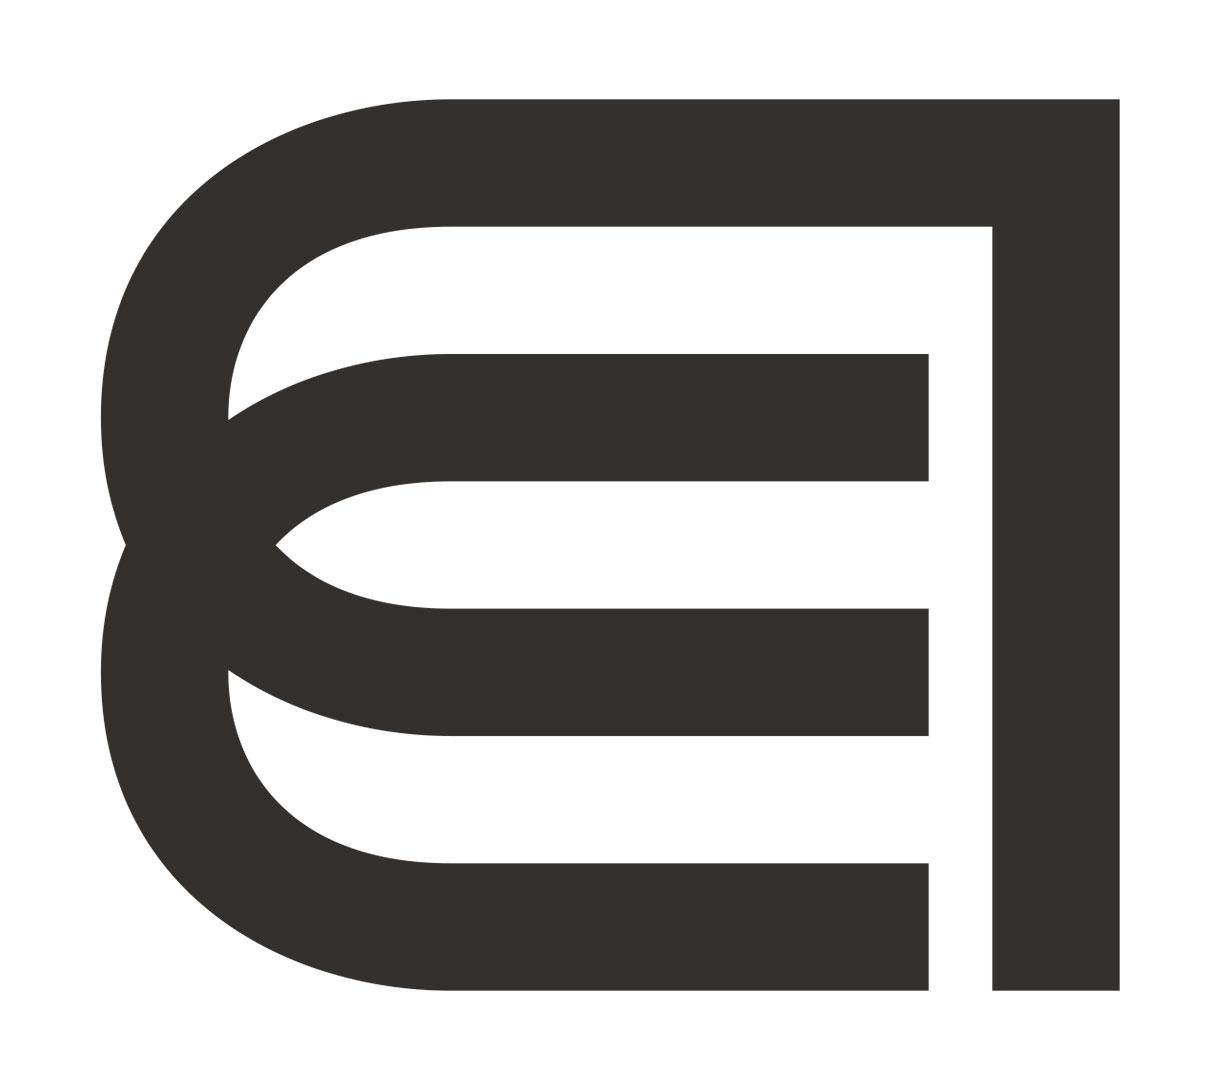 brato-logo